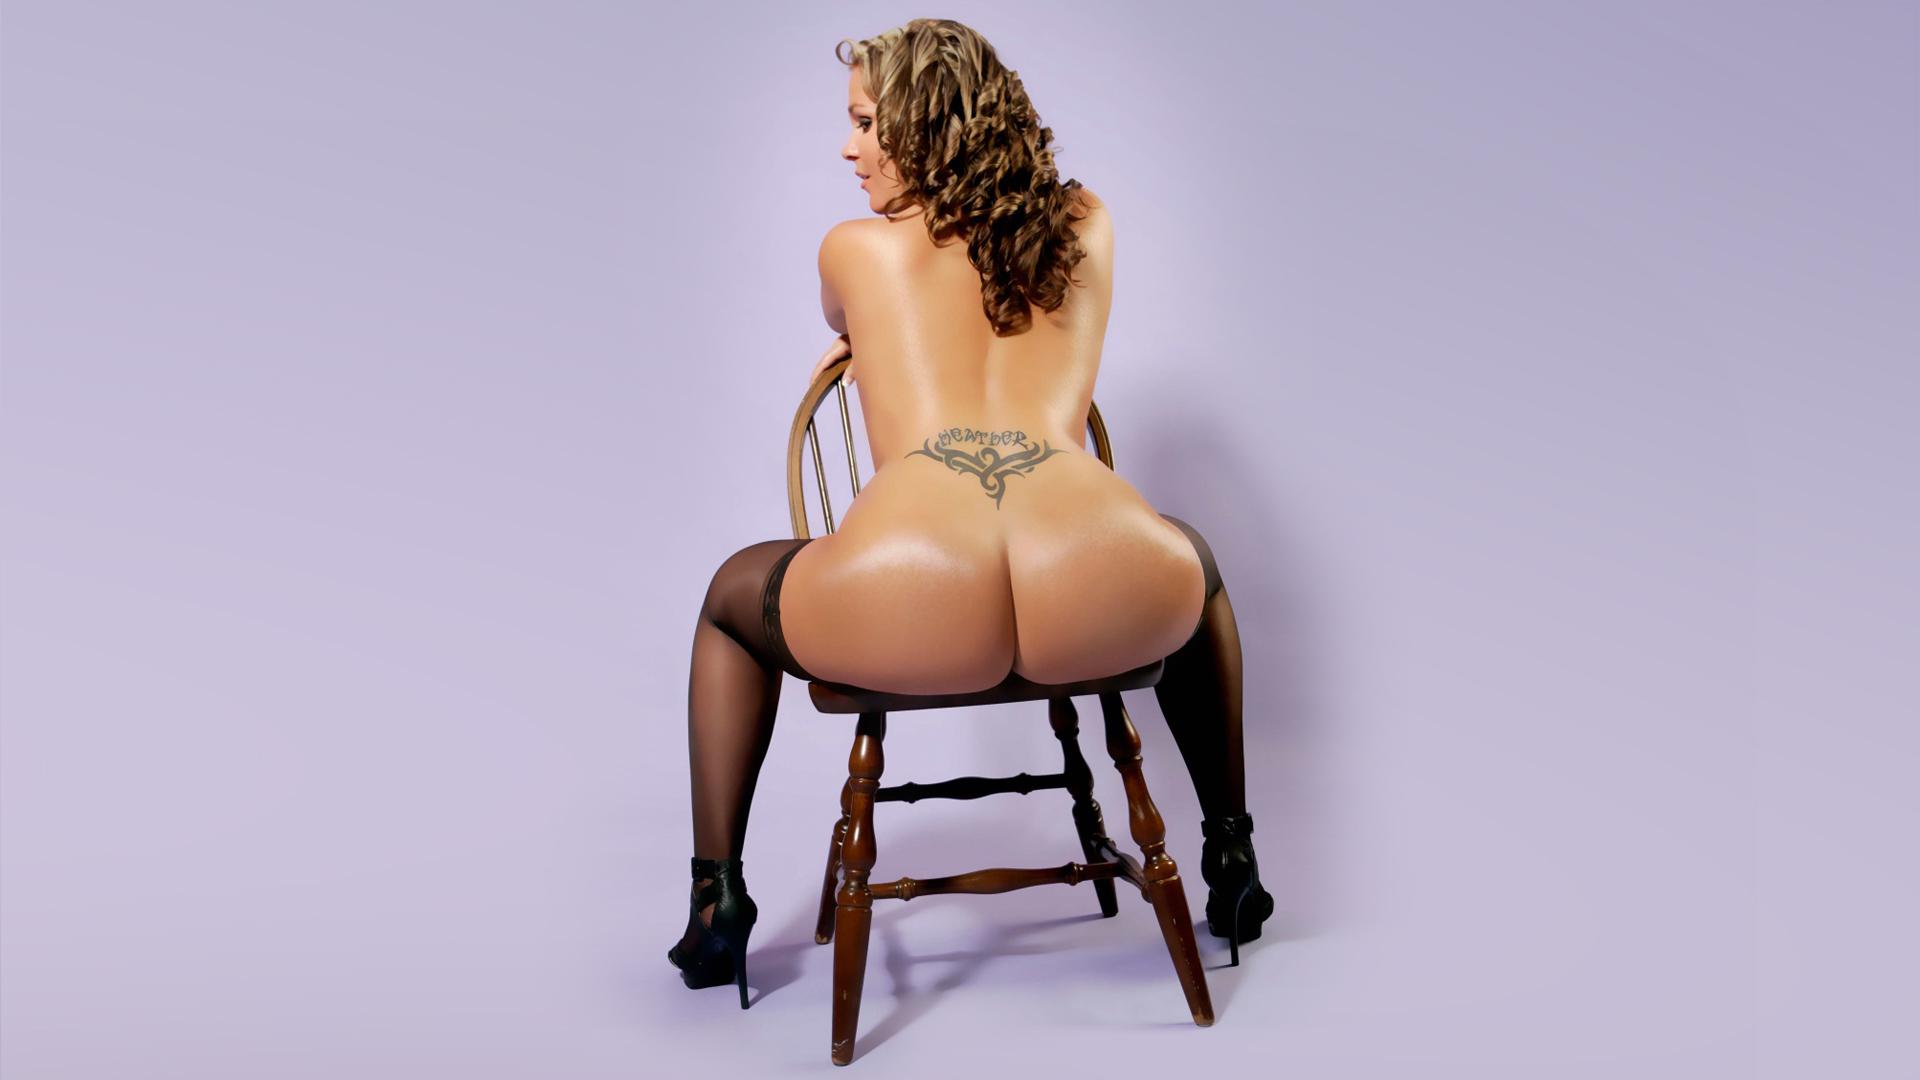 Онлайн картинки голые попки на рабочий стол эротика — img 14